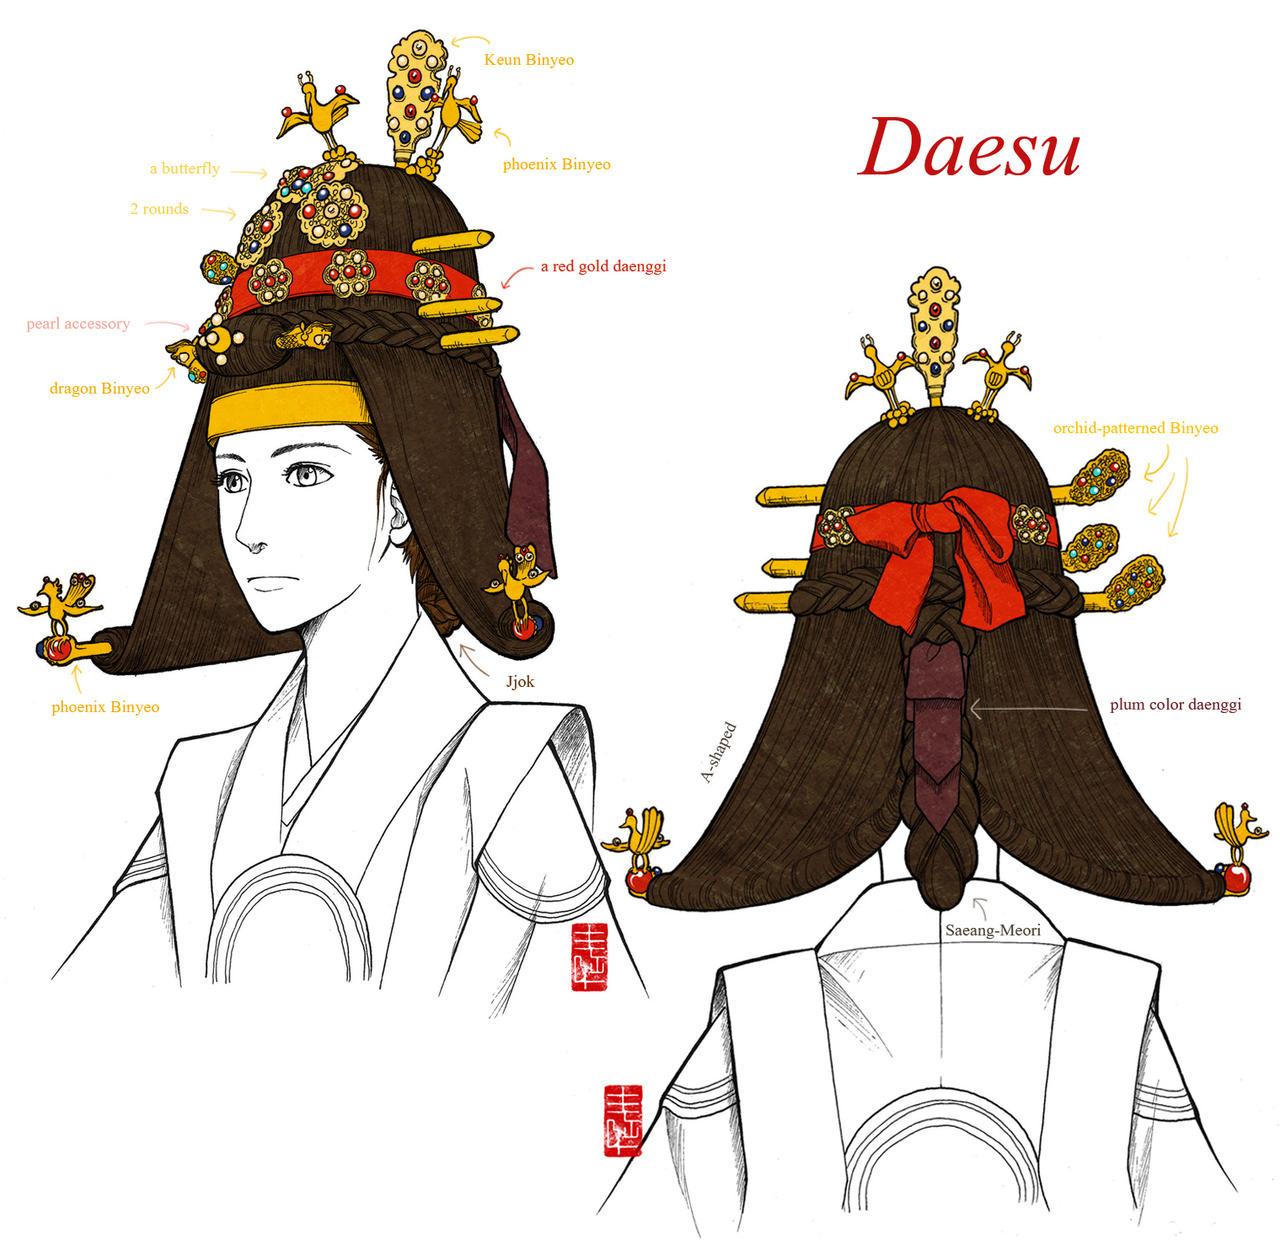 Daesu by Glimja